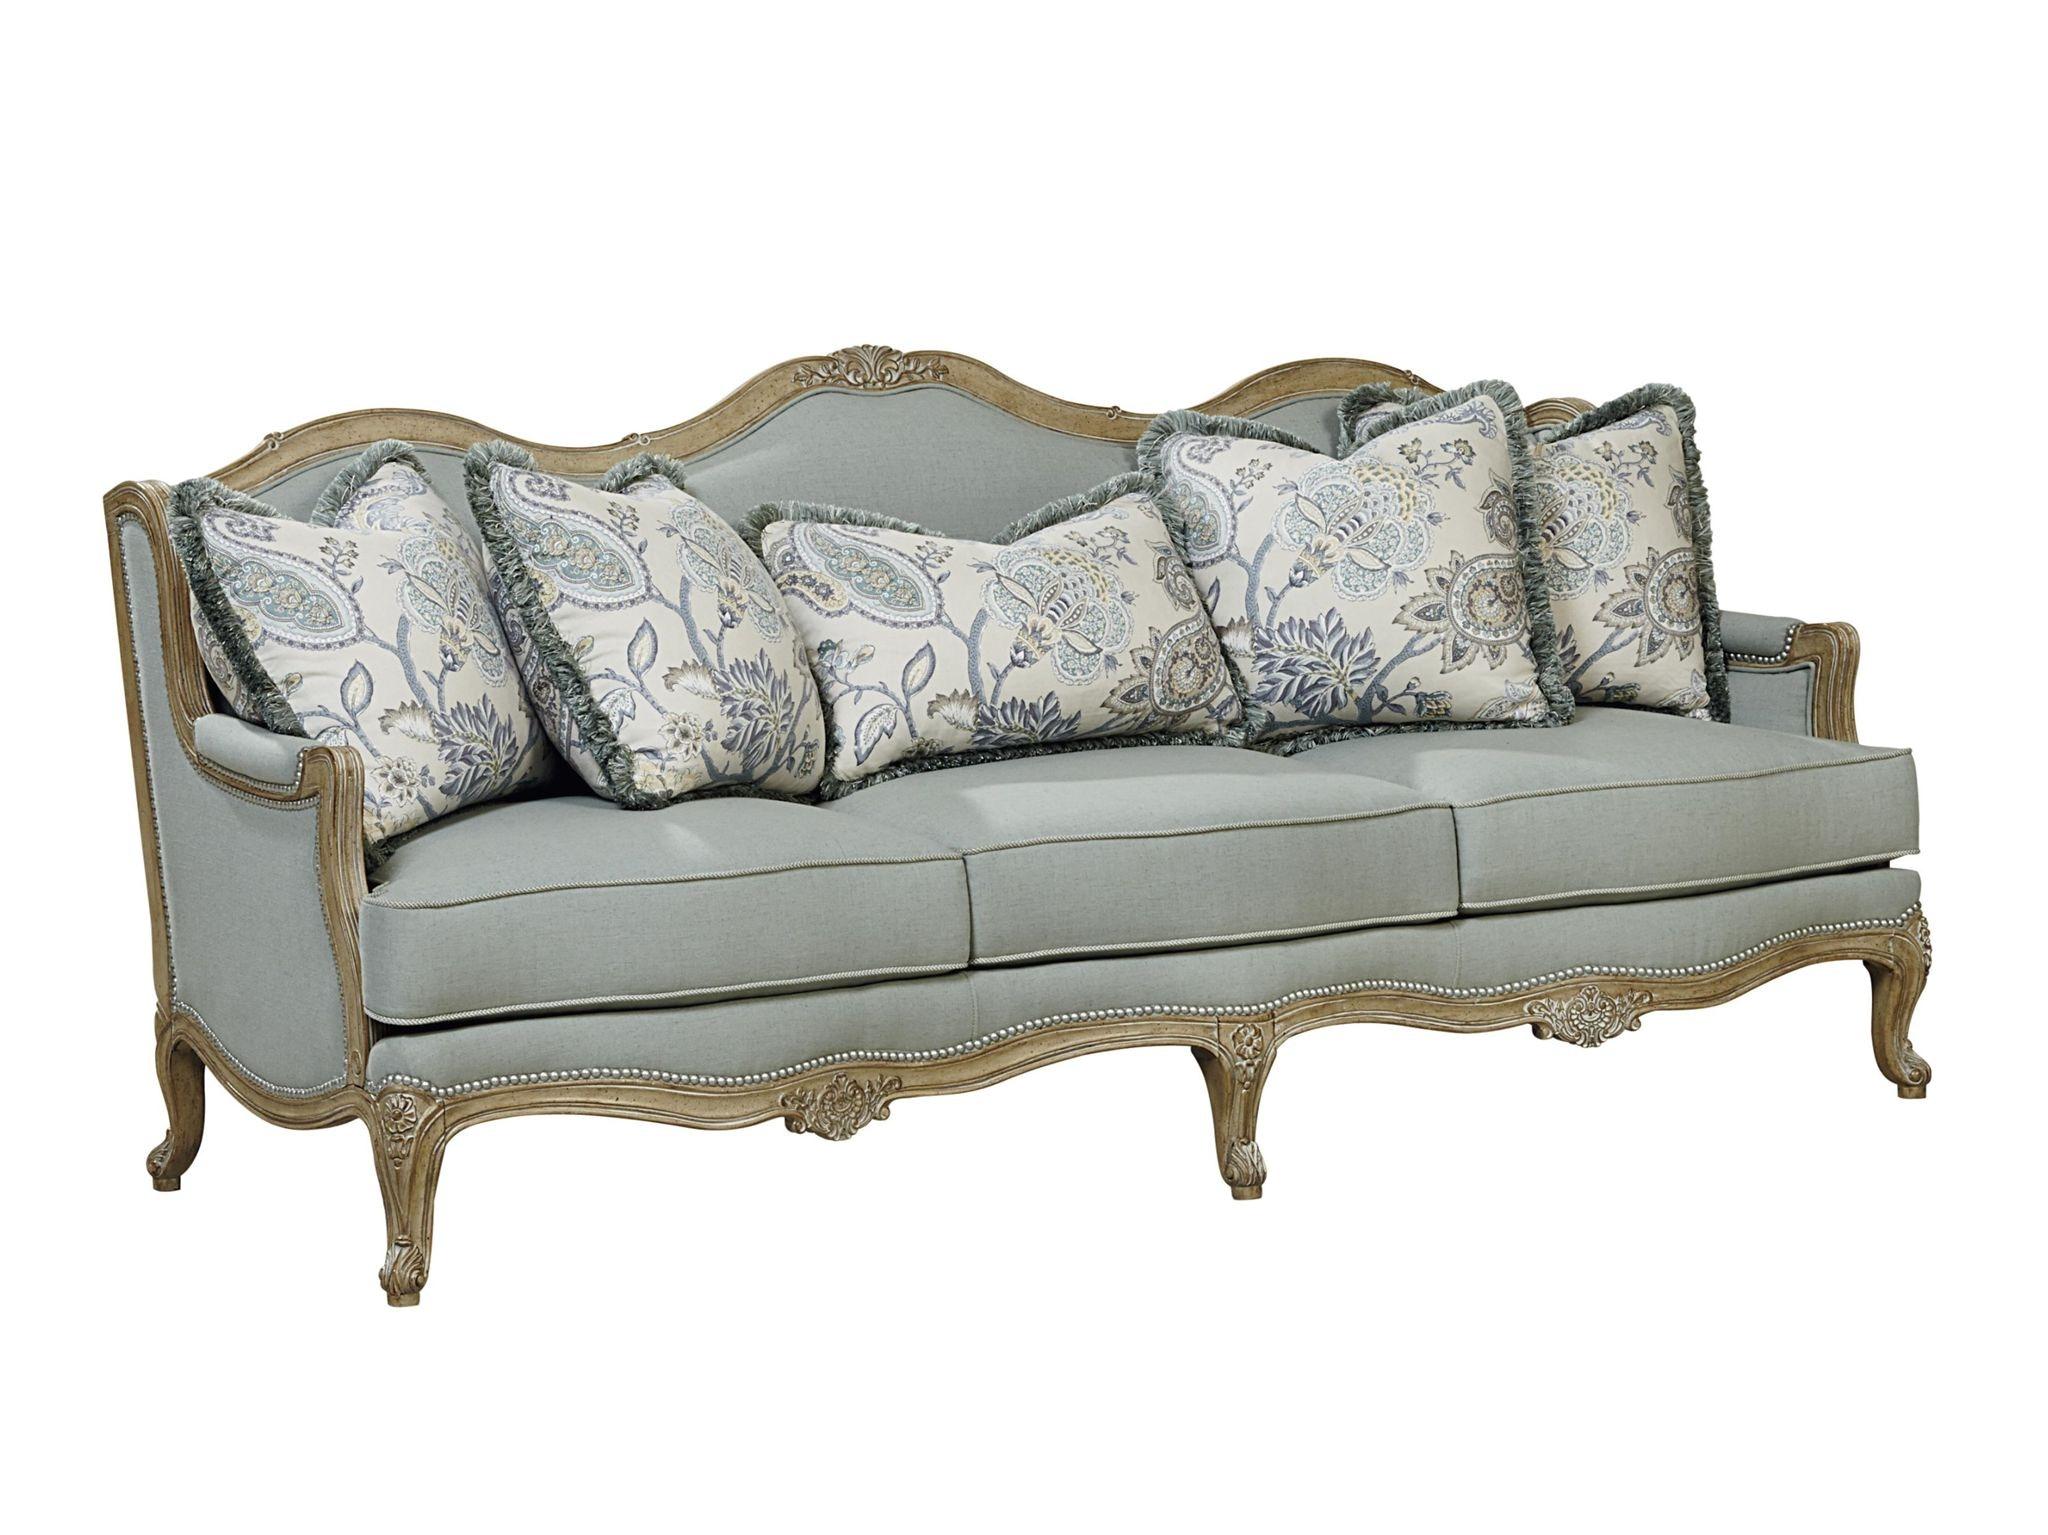 Fine Furniture Design Cabriole Sofa 4515 01